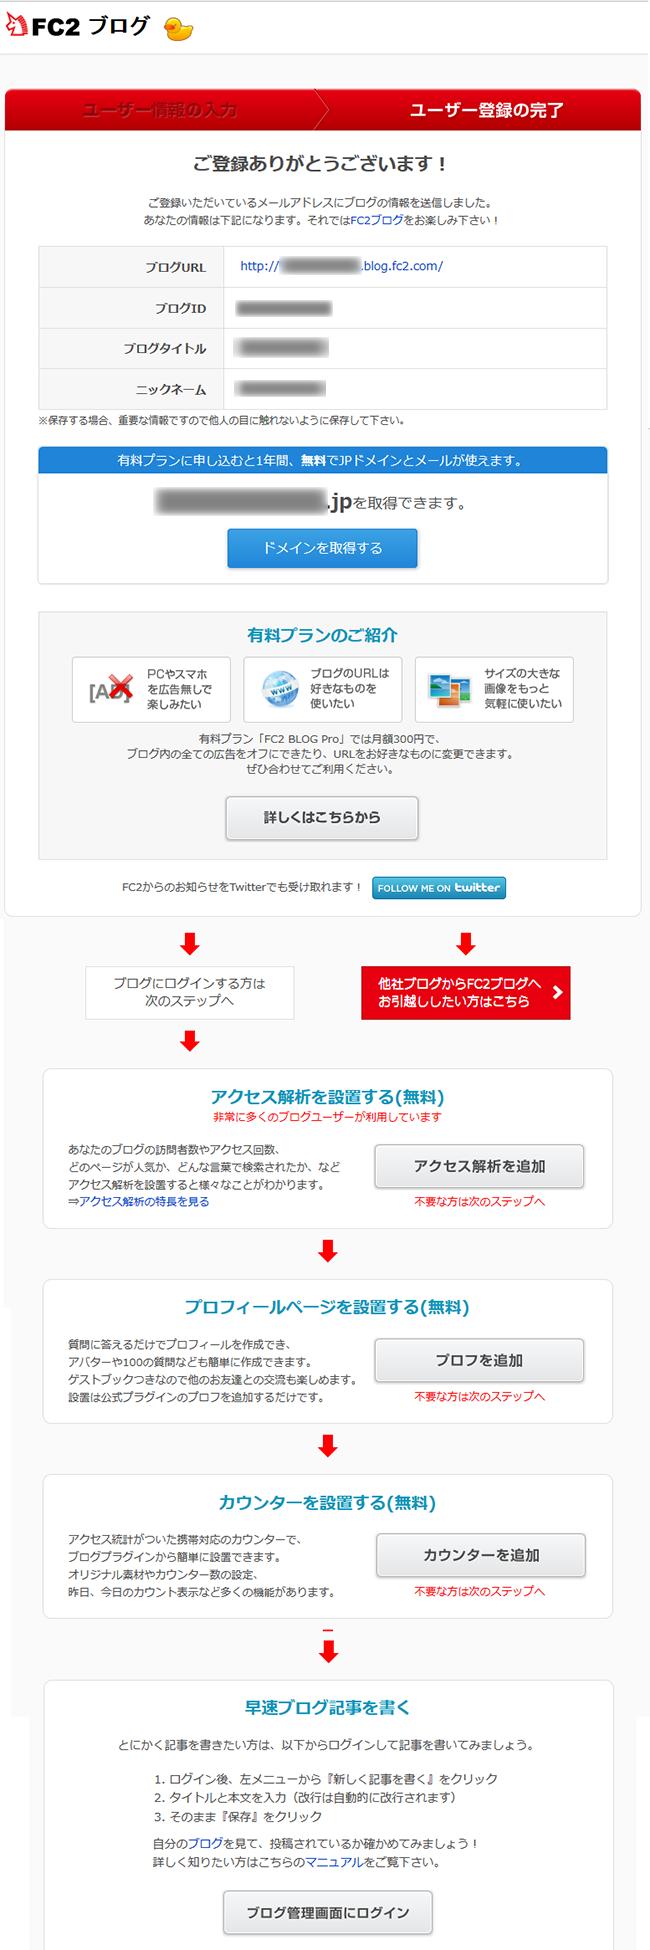 FC2_ブログサービス追加完了画面